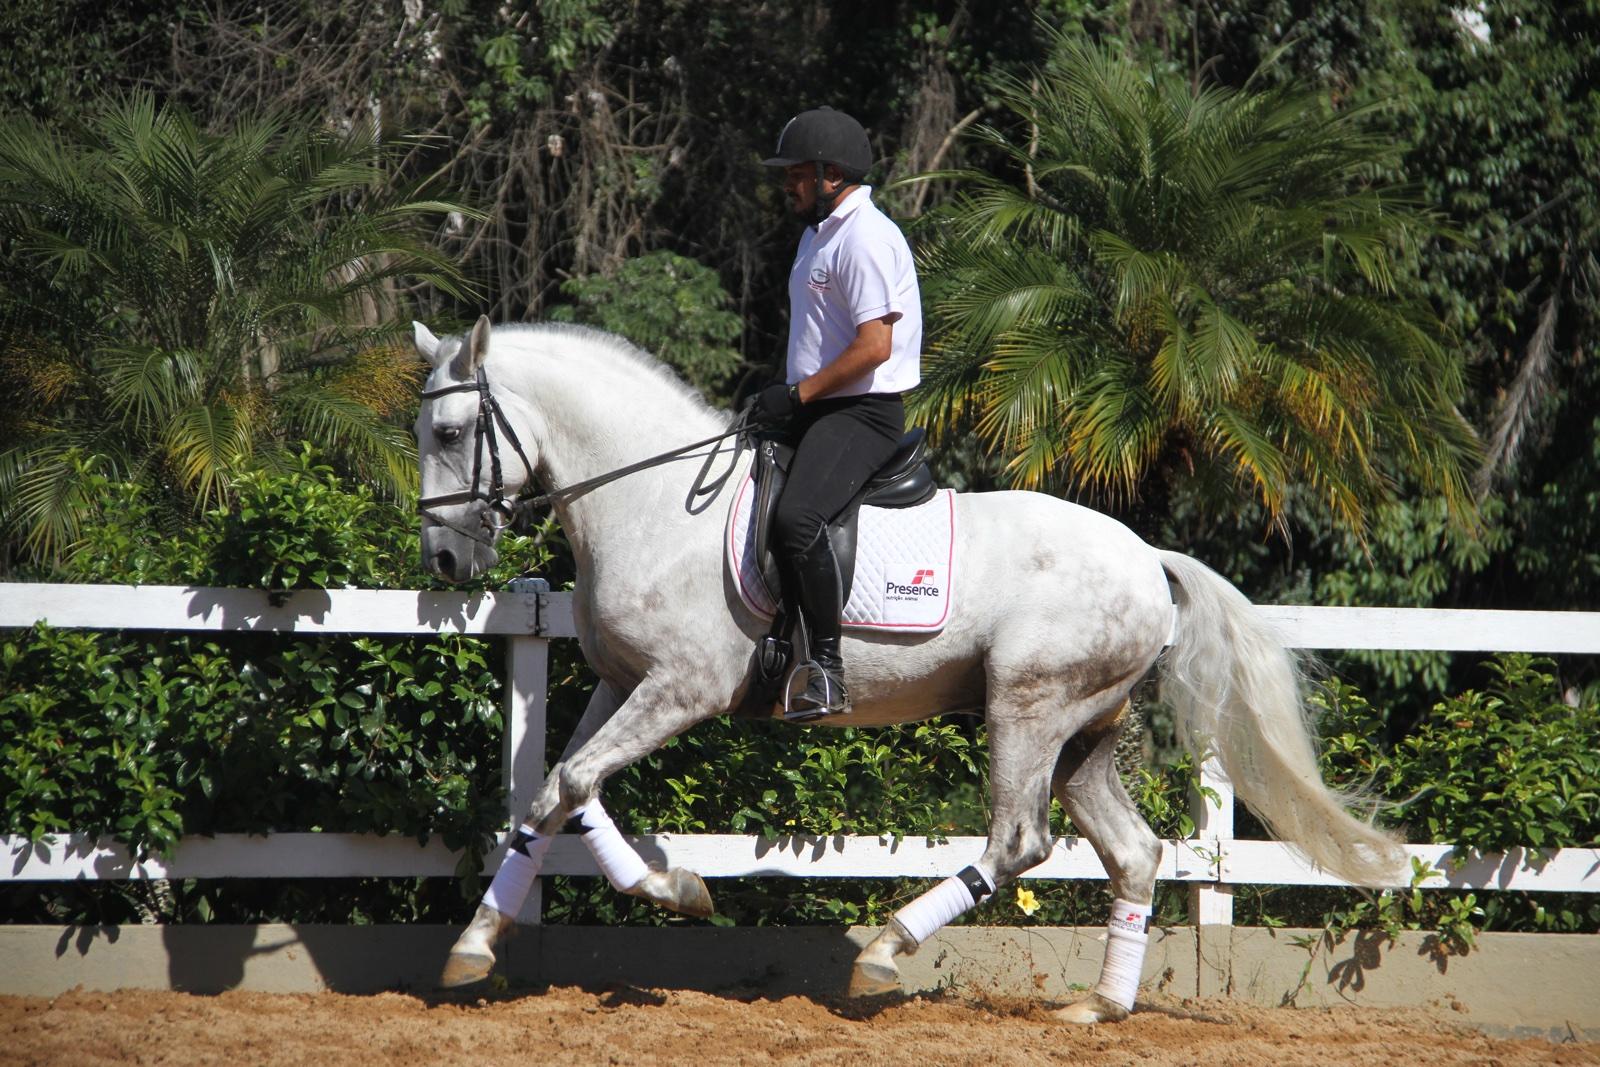 Haras das Mangueiras - Cavalos a Vendas - First das Mangueiras